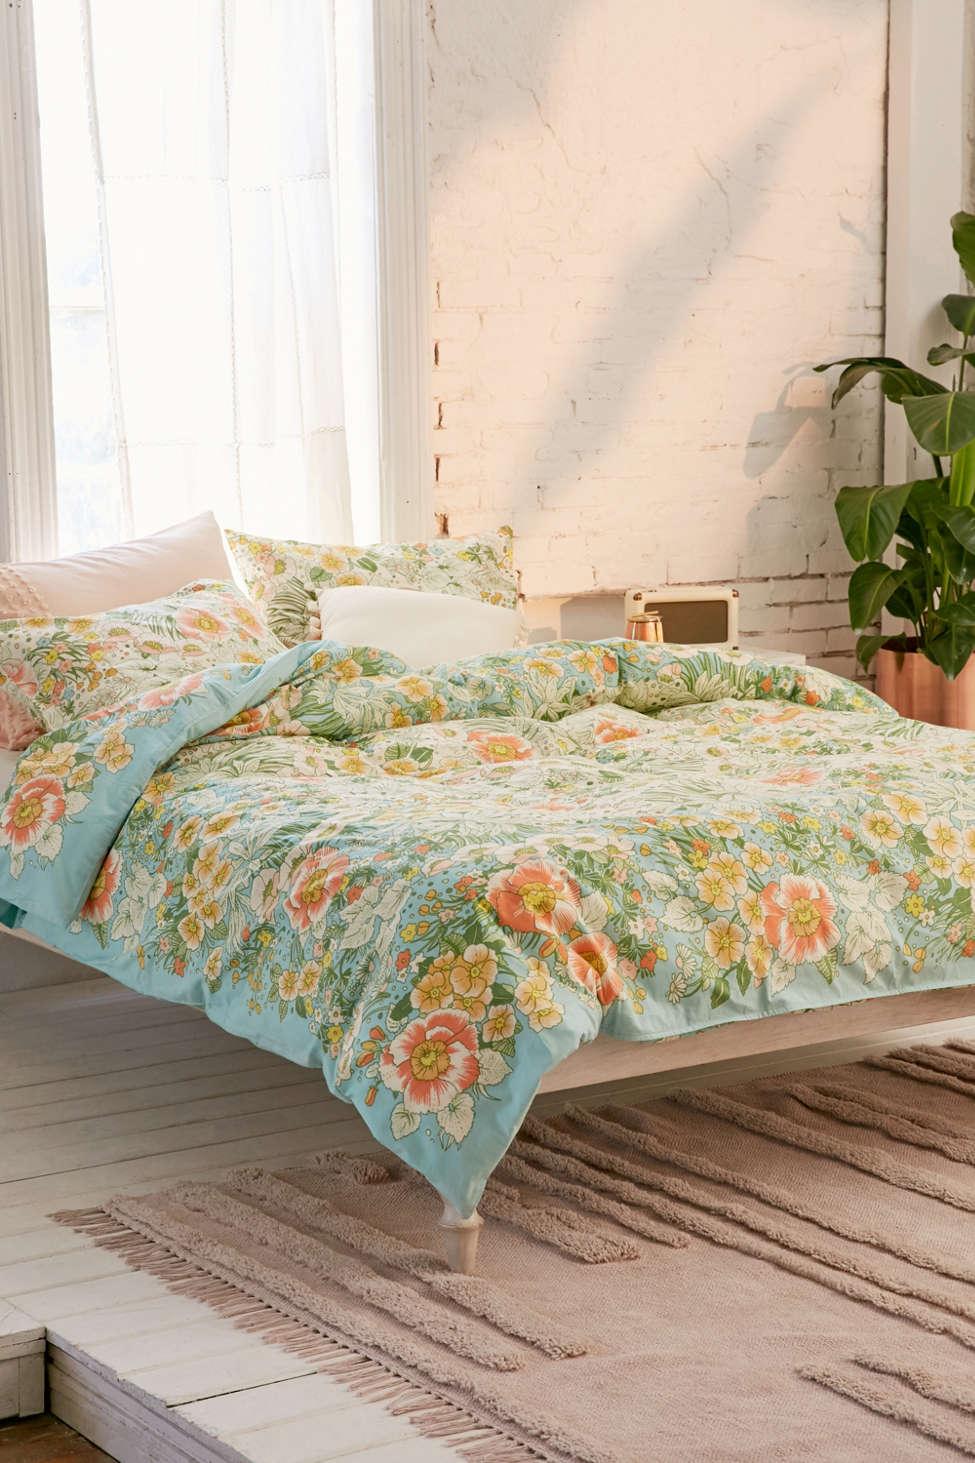 Slide View: 1: Lovise Floral Scarf Duvet Cover